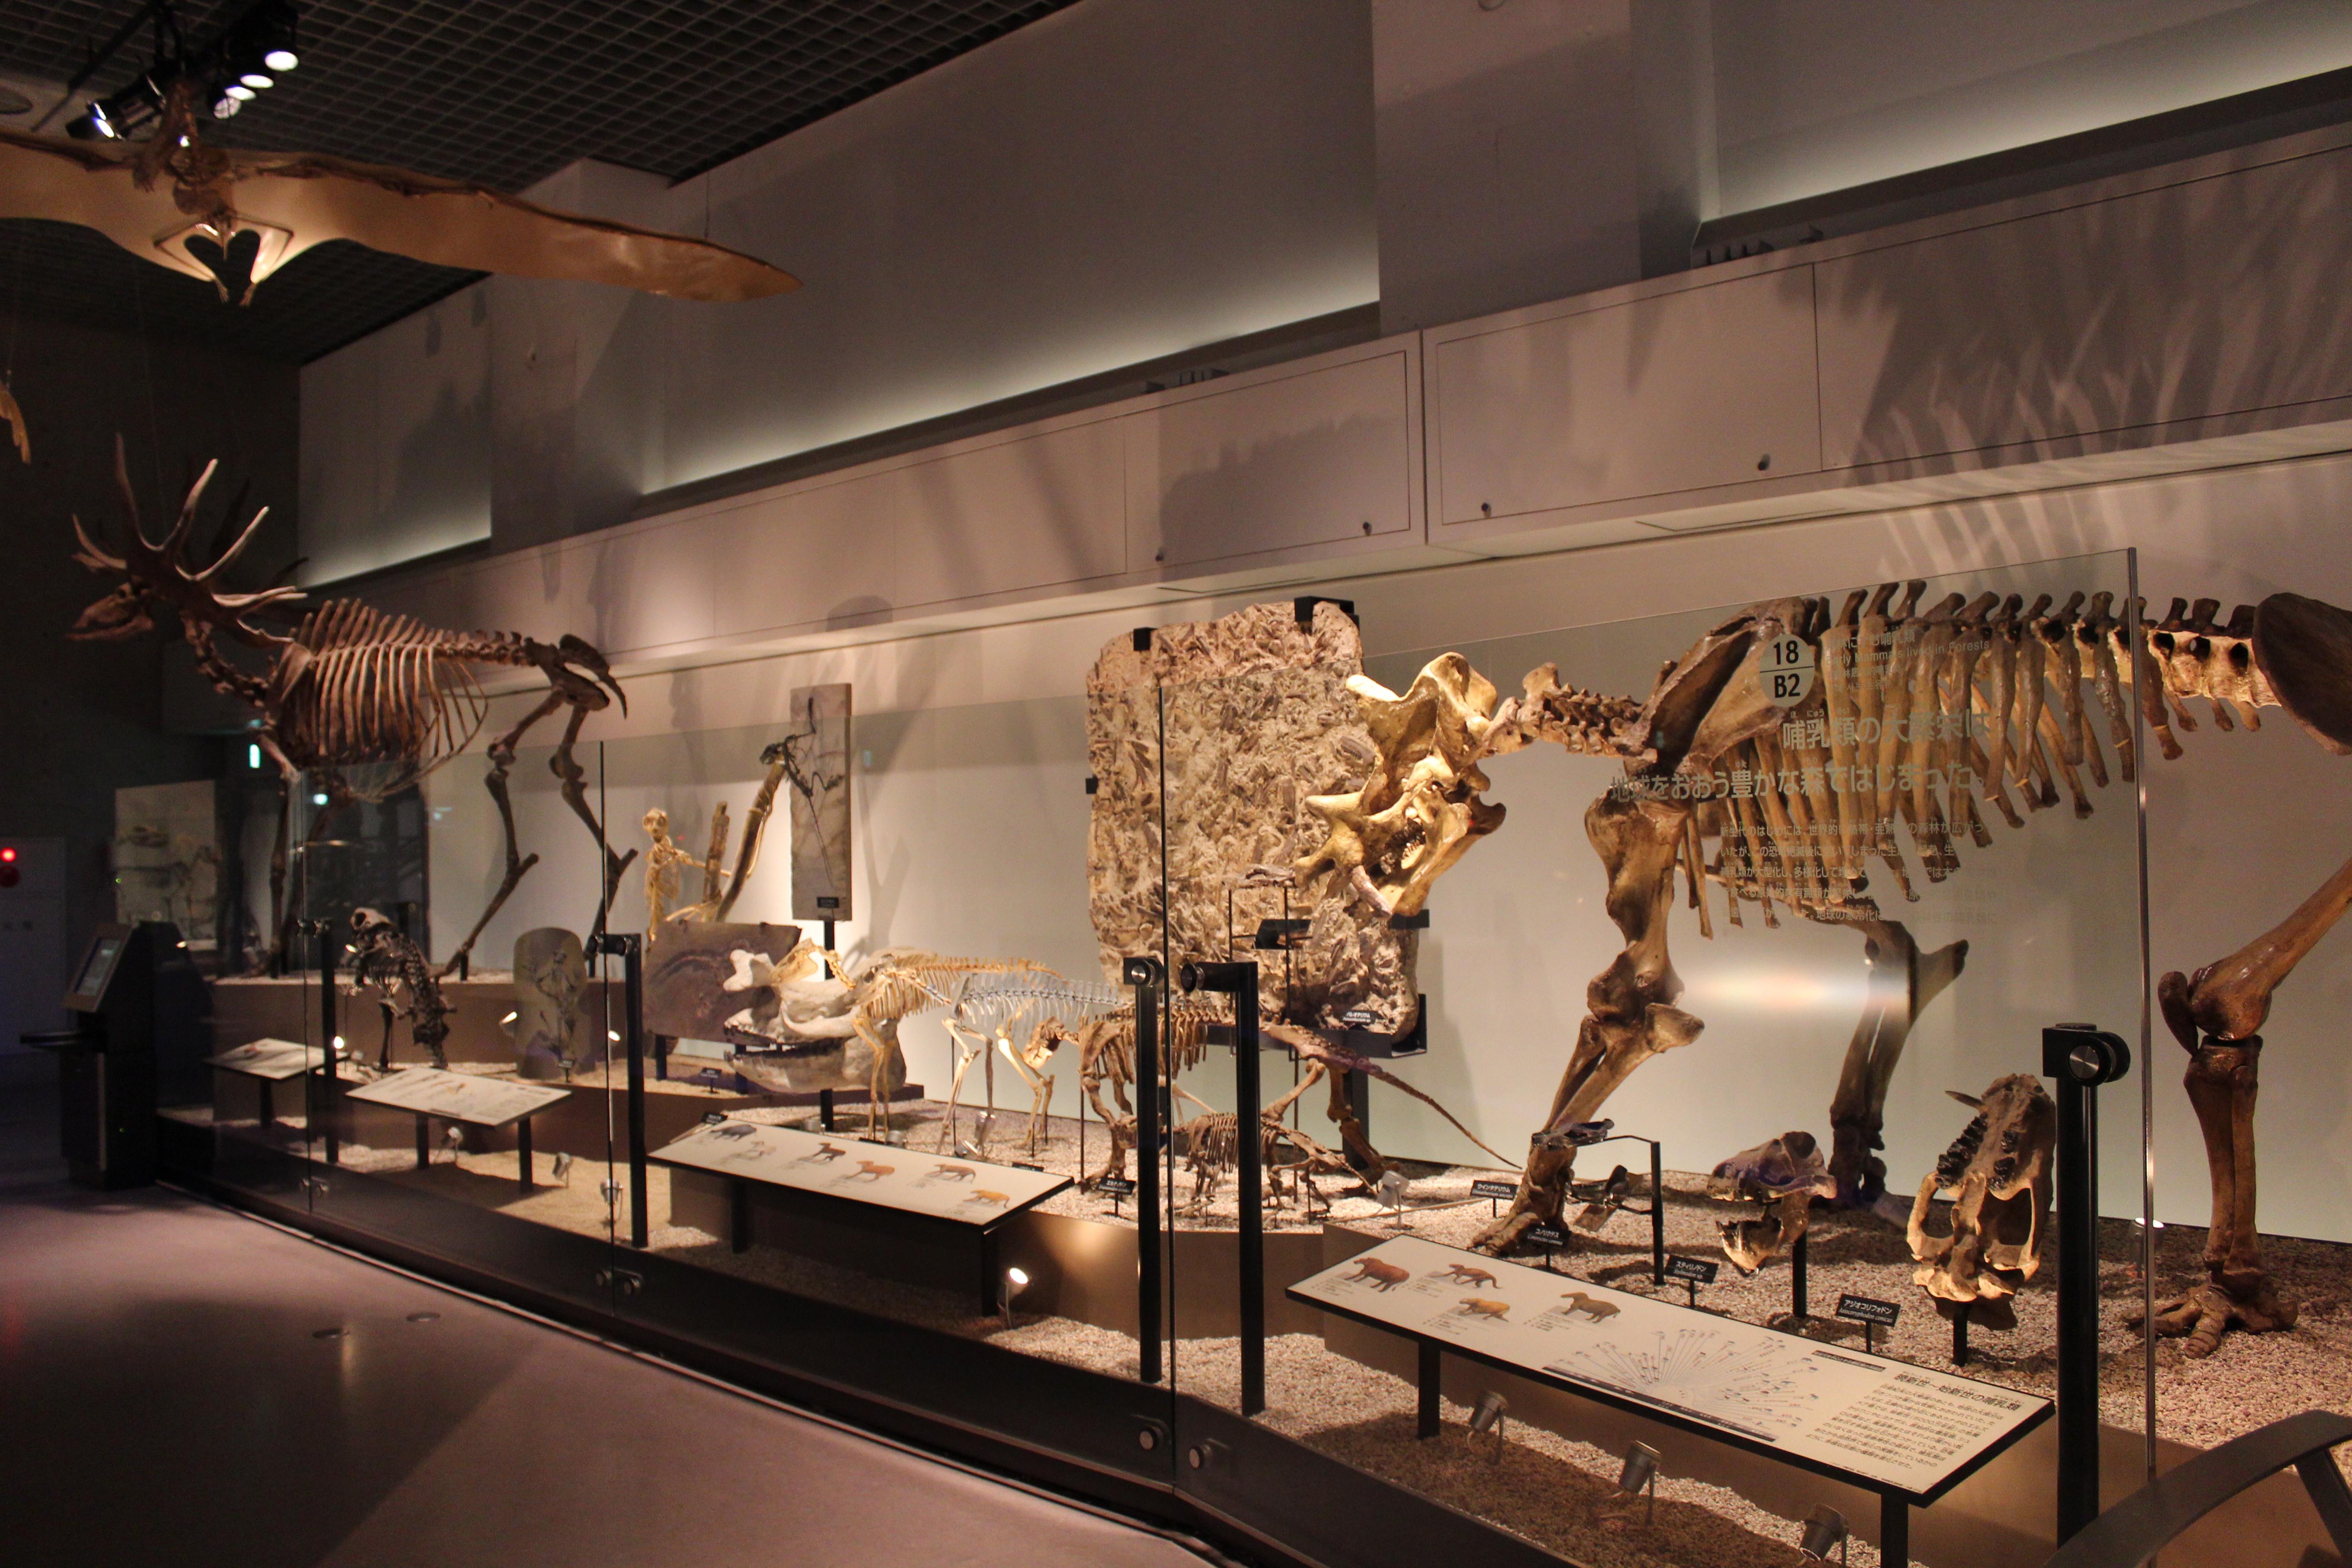 http://pangea-note.com/museum/blogimg/IMG_0520.JPG